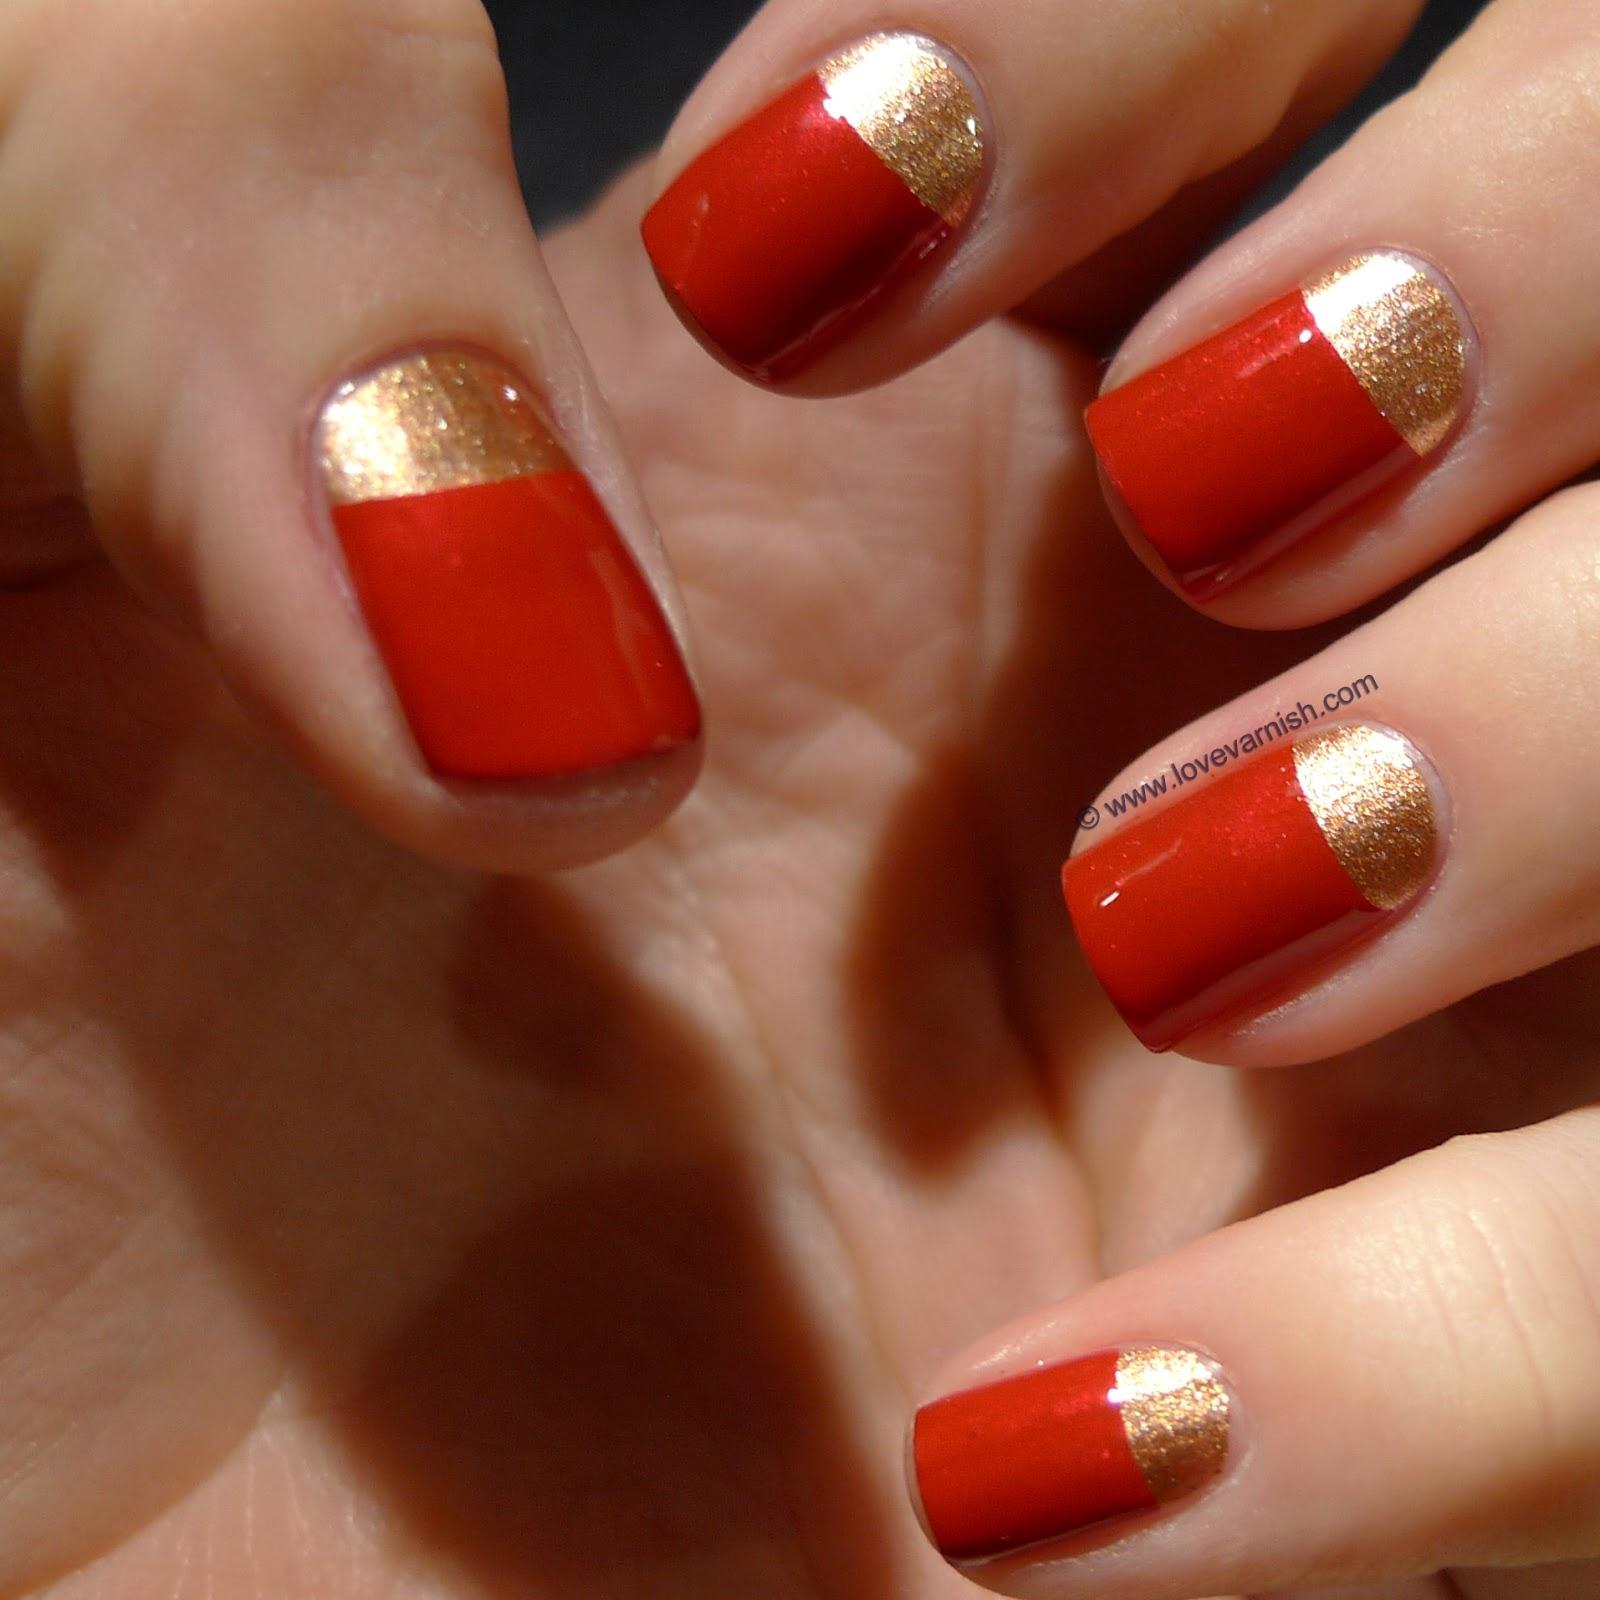 Love Varnish: 31 Day Nail Art Challenge - Red Nails!